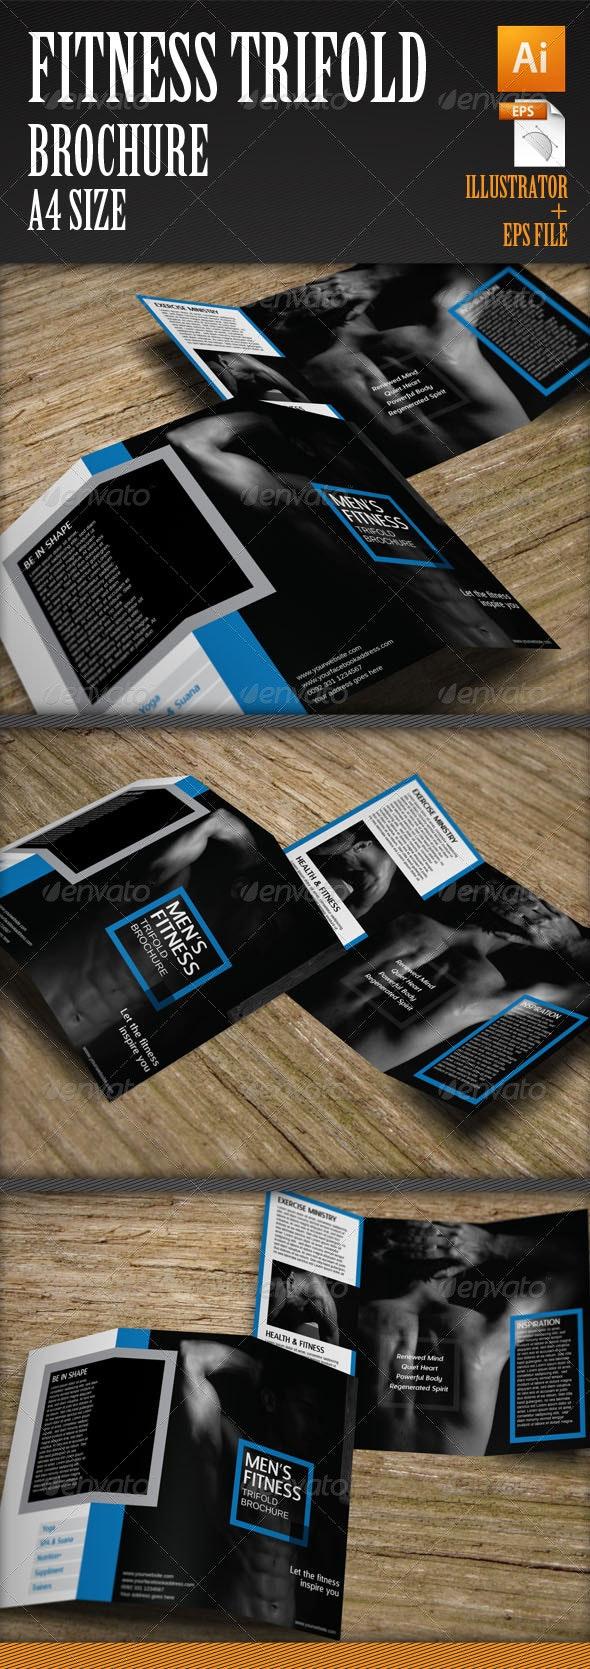 Men's Fitness Trifold Brochure Template - Corporate Brochures